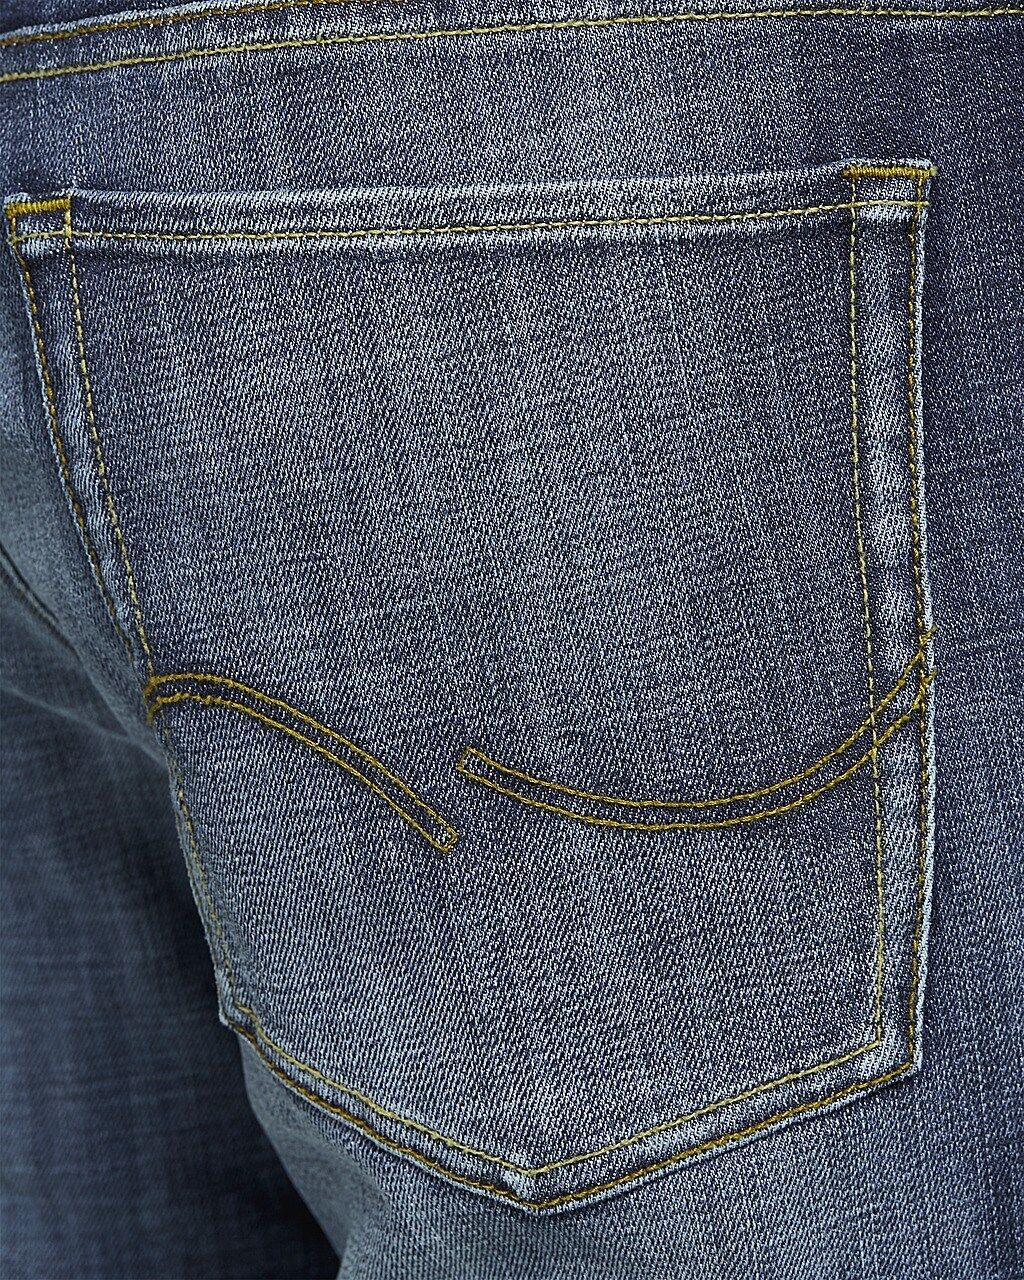 JACK & JONES Jeans da Uomo Clark Clark Clark Regular Fit Straight pantaloni denim blu GE255 risciacquati 668bcd